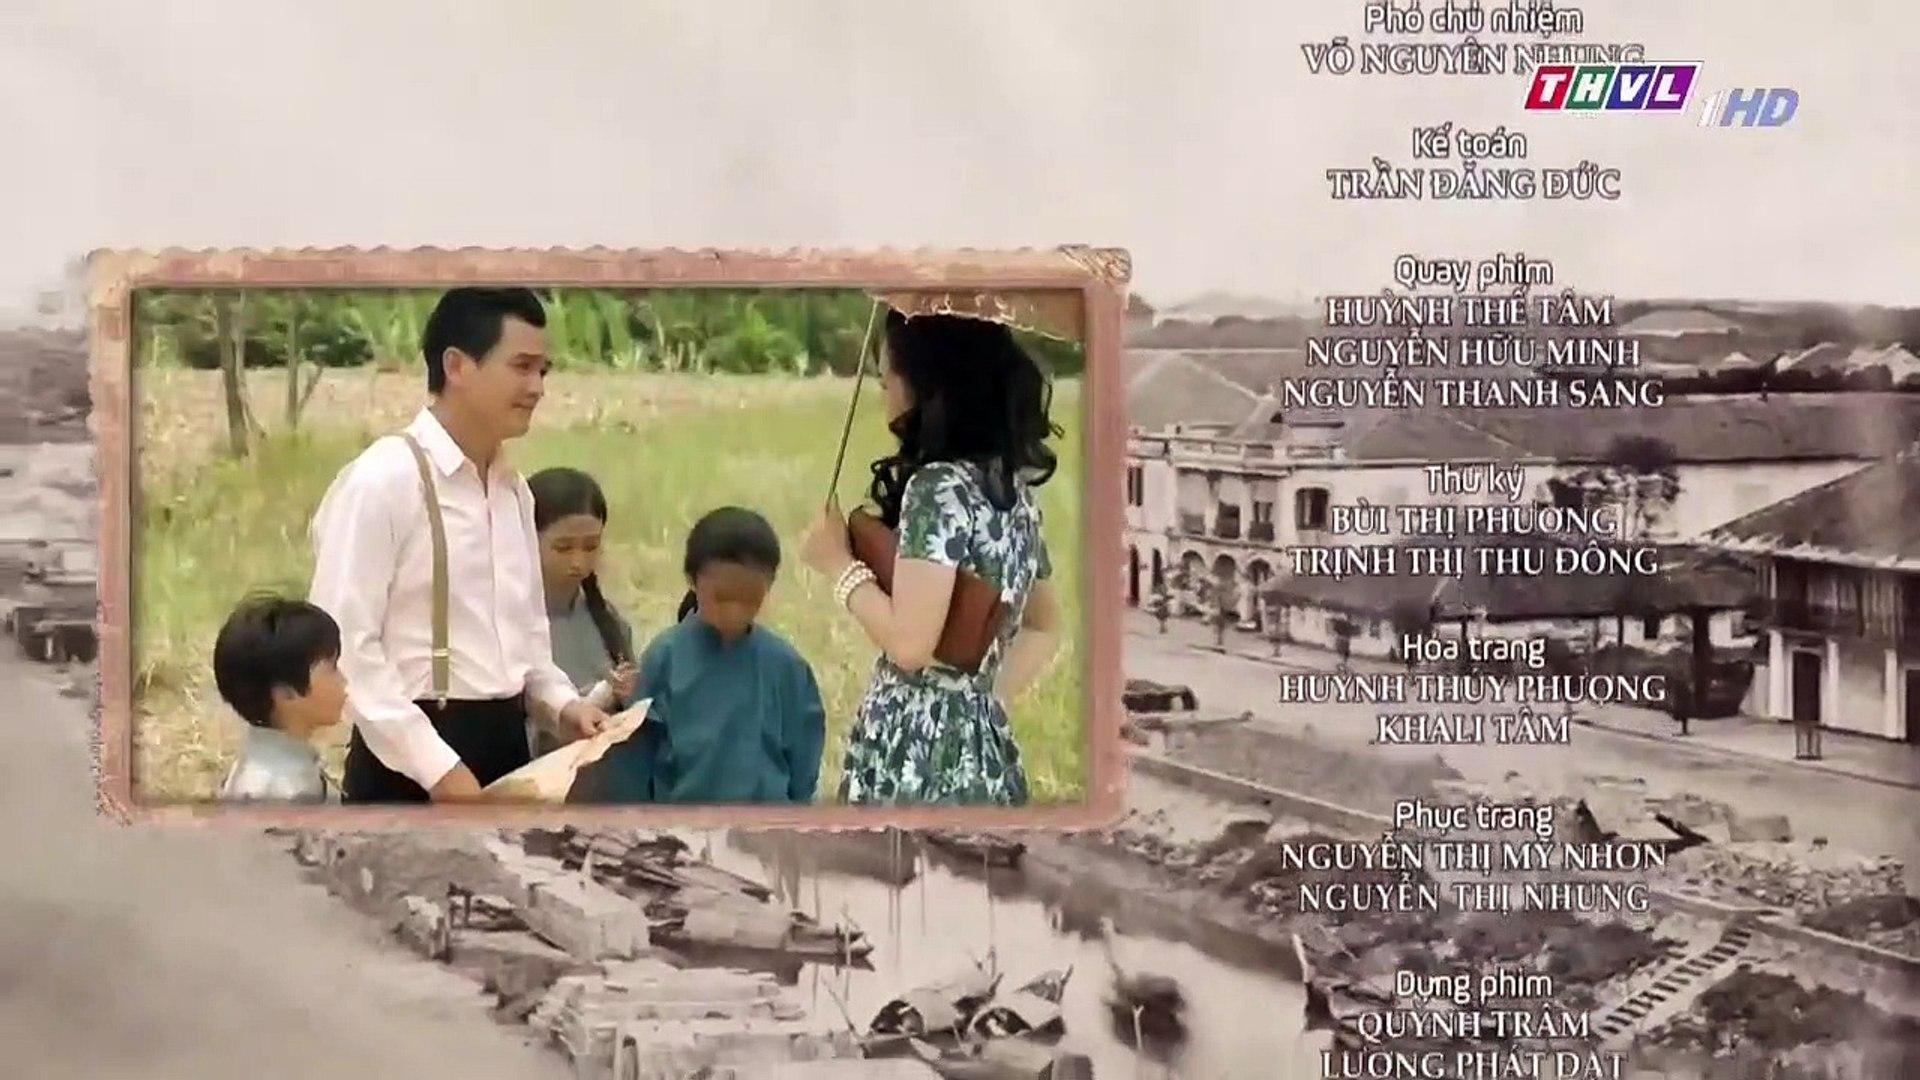 Tiếng sét trong mưa tập 17 ** Phim Việt Nam THVL1 ** Phim tieng set trong mua tap 18 ** Phim tieng s